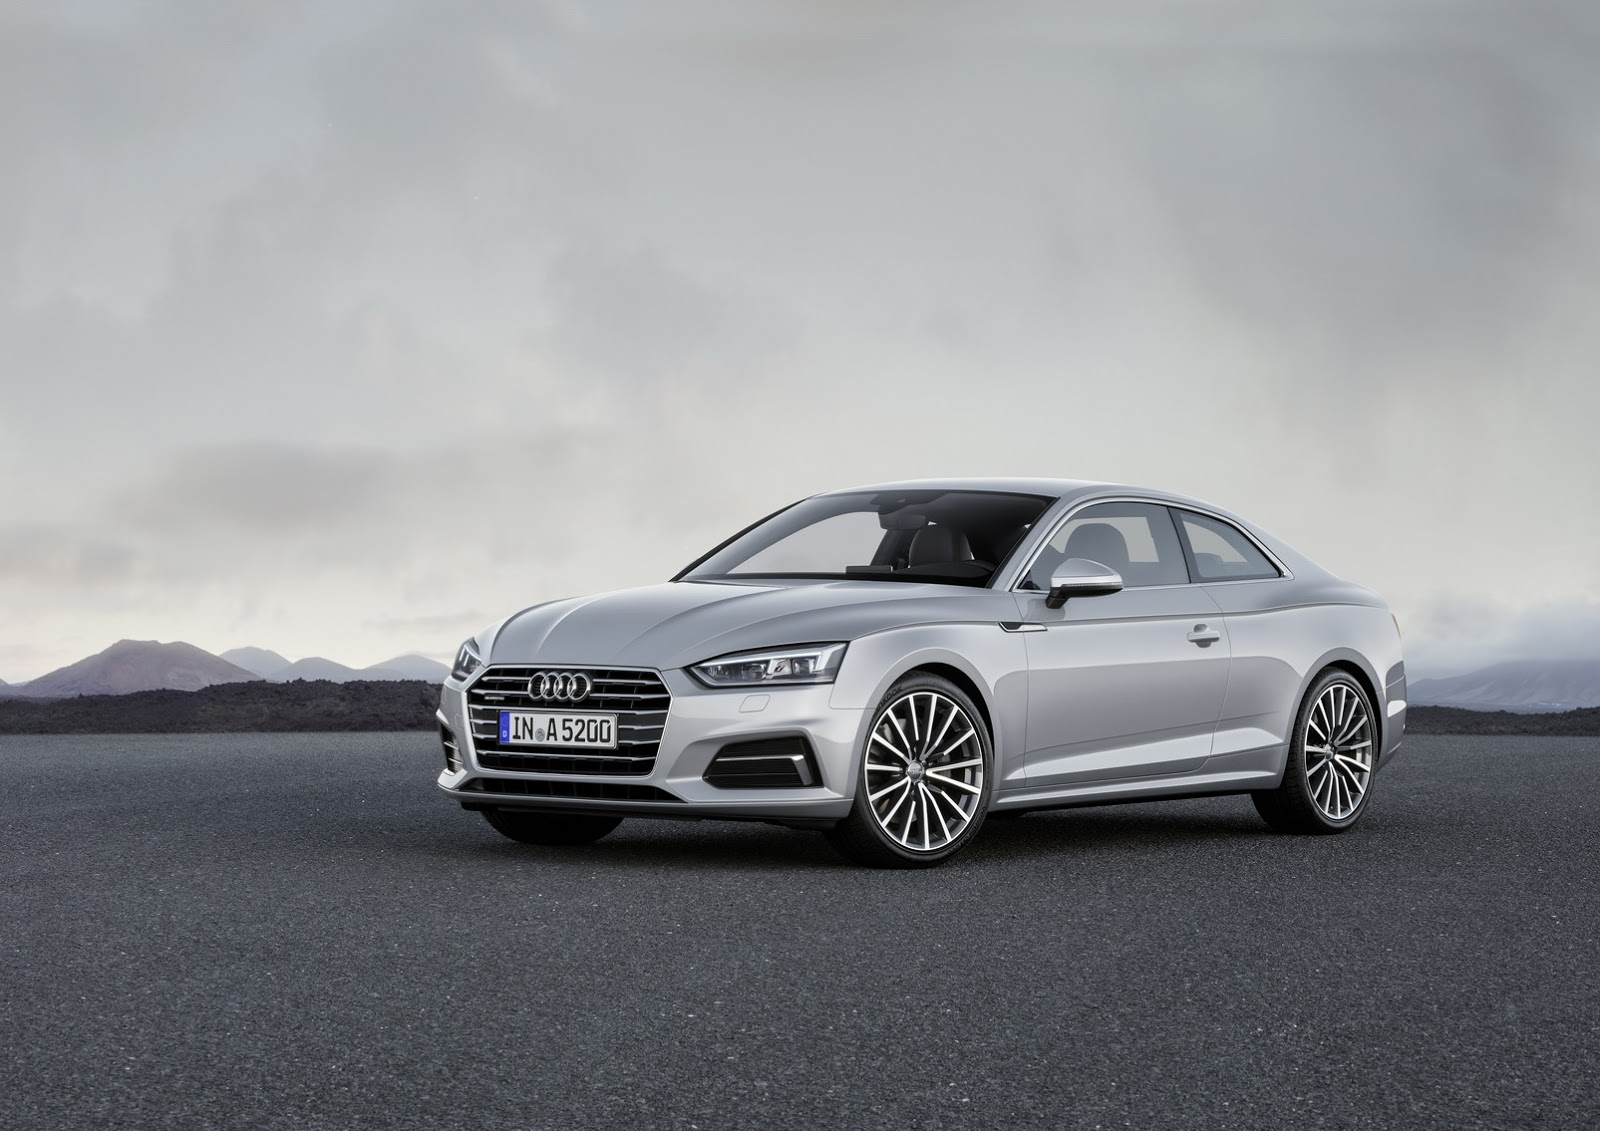 Kelebihan Audi A5 3.0 Murah Berkualitas